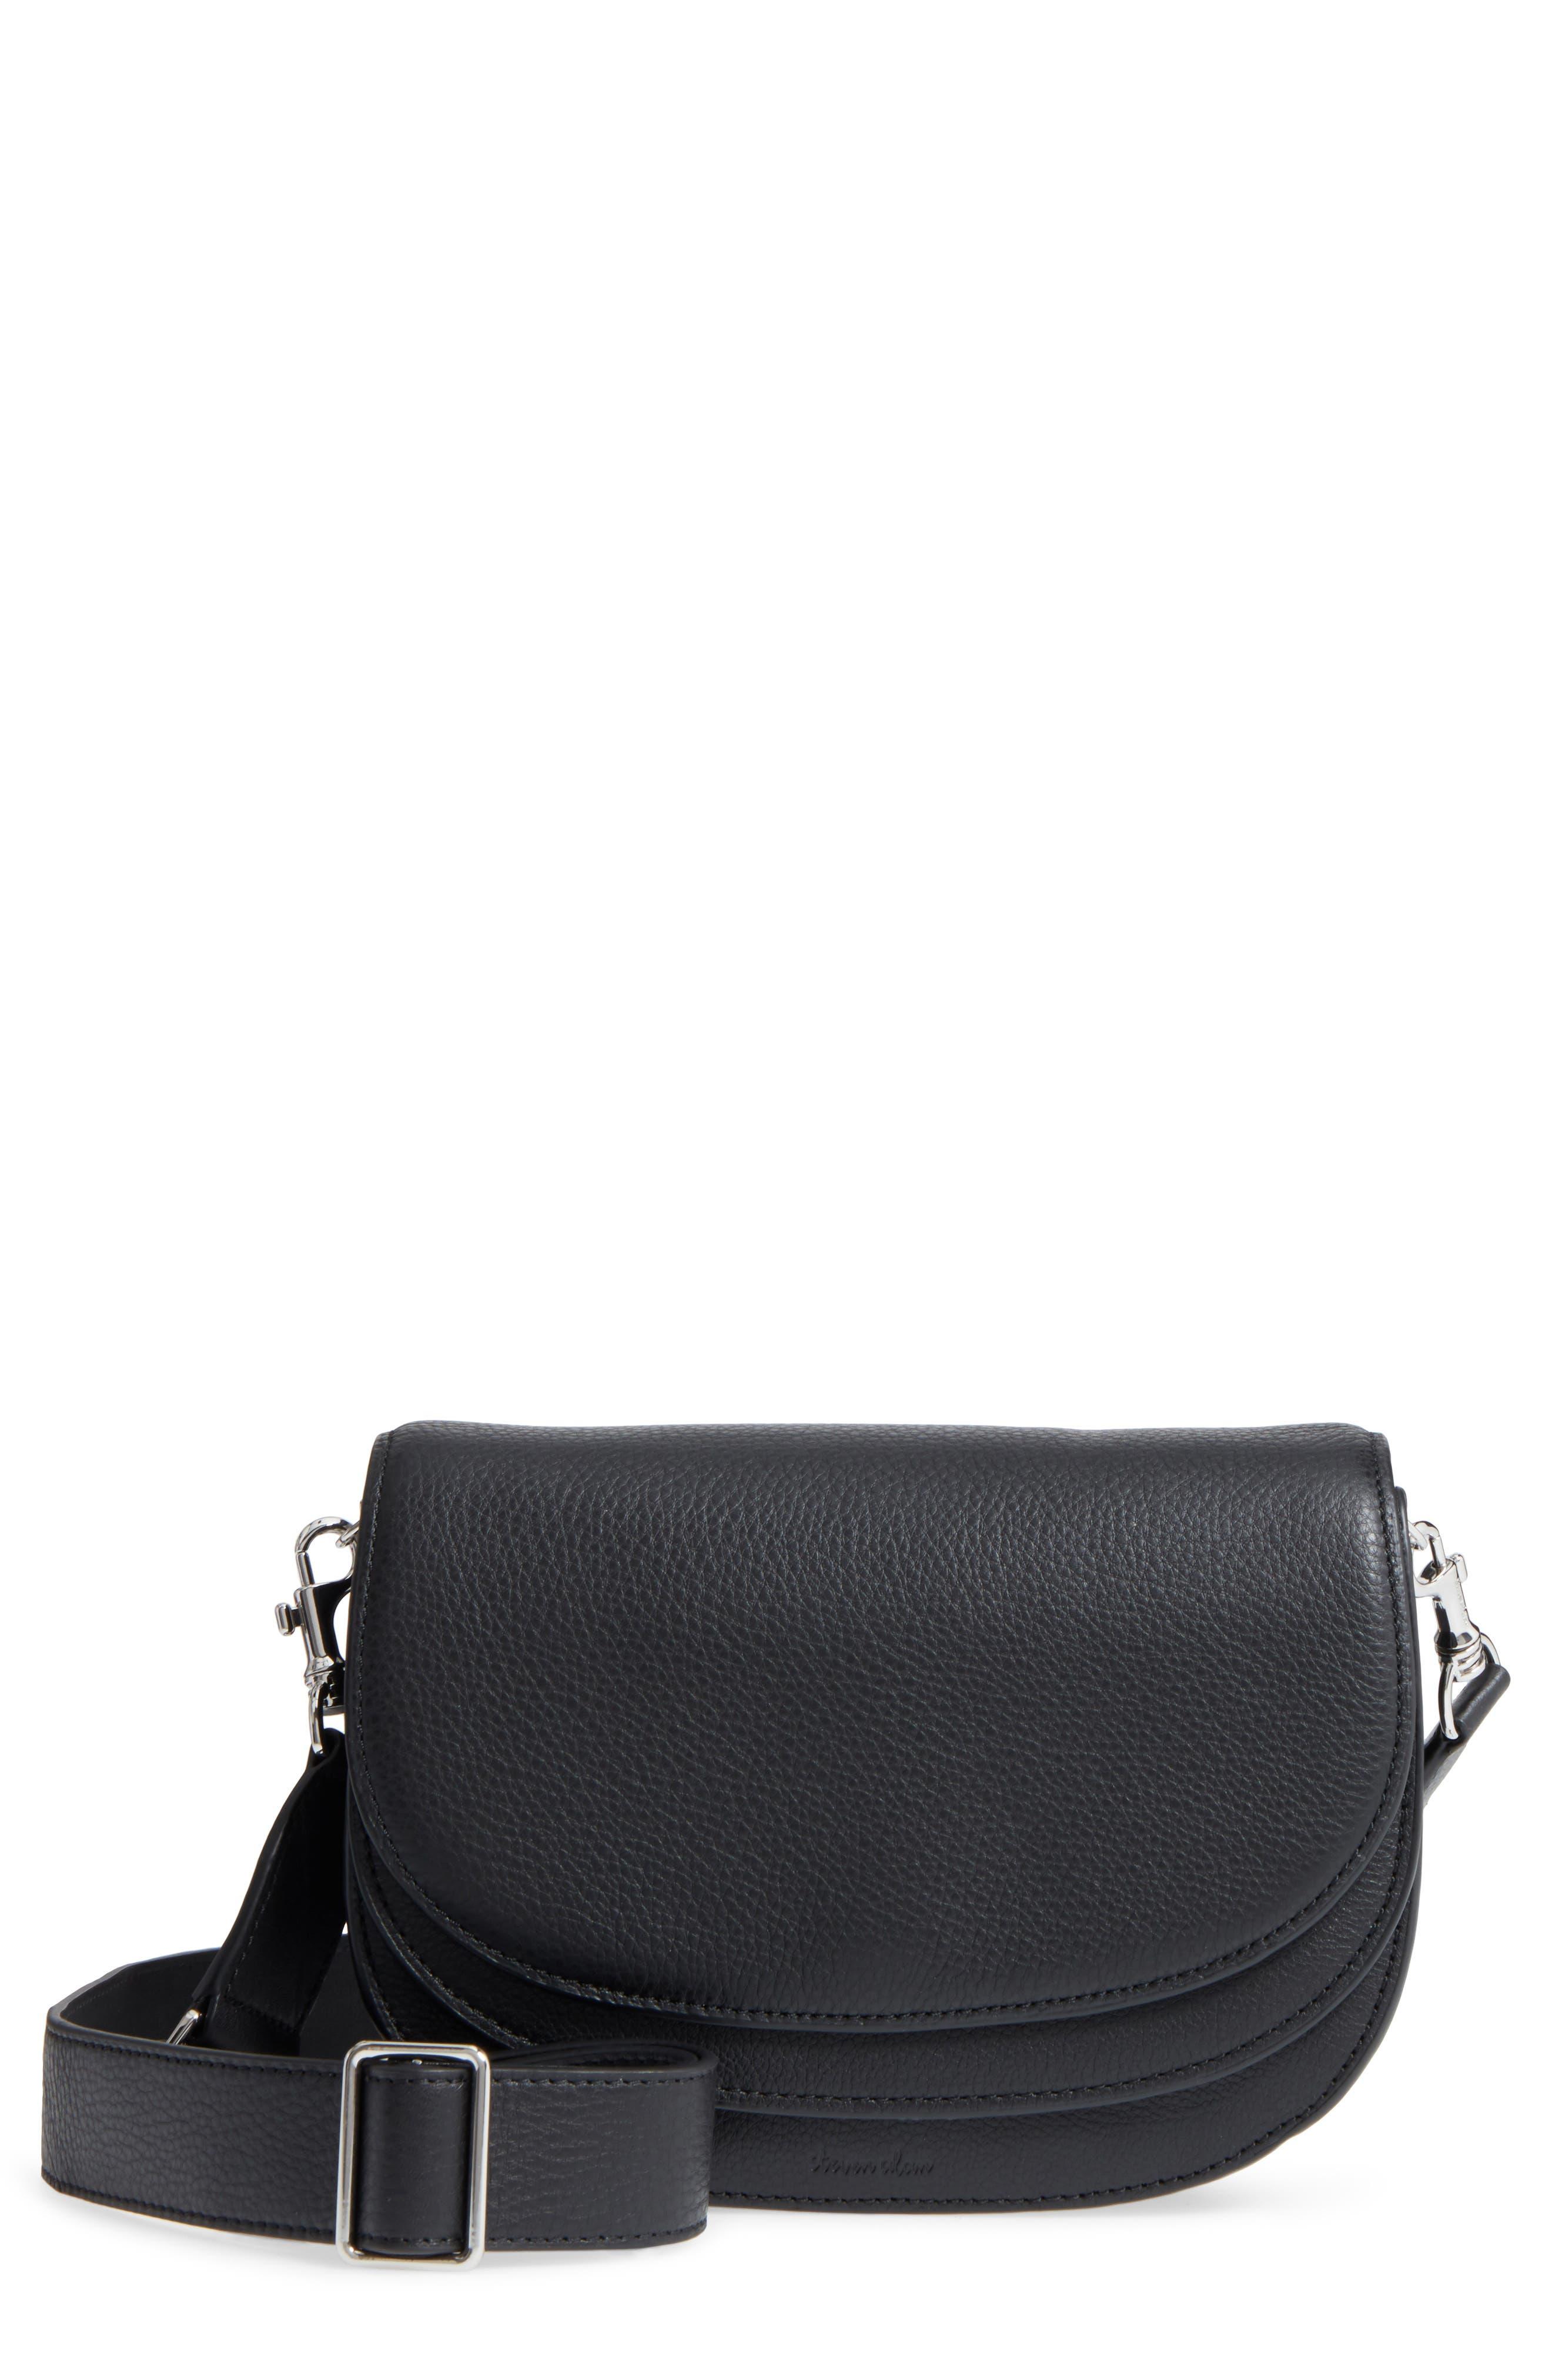 Landon Leather Crossbody Saddle Bag,                         Main,                         color,